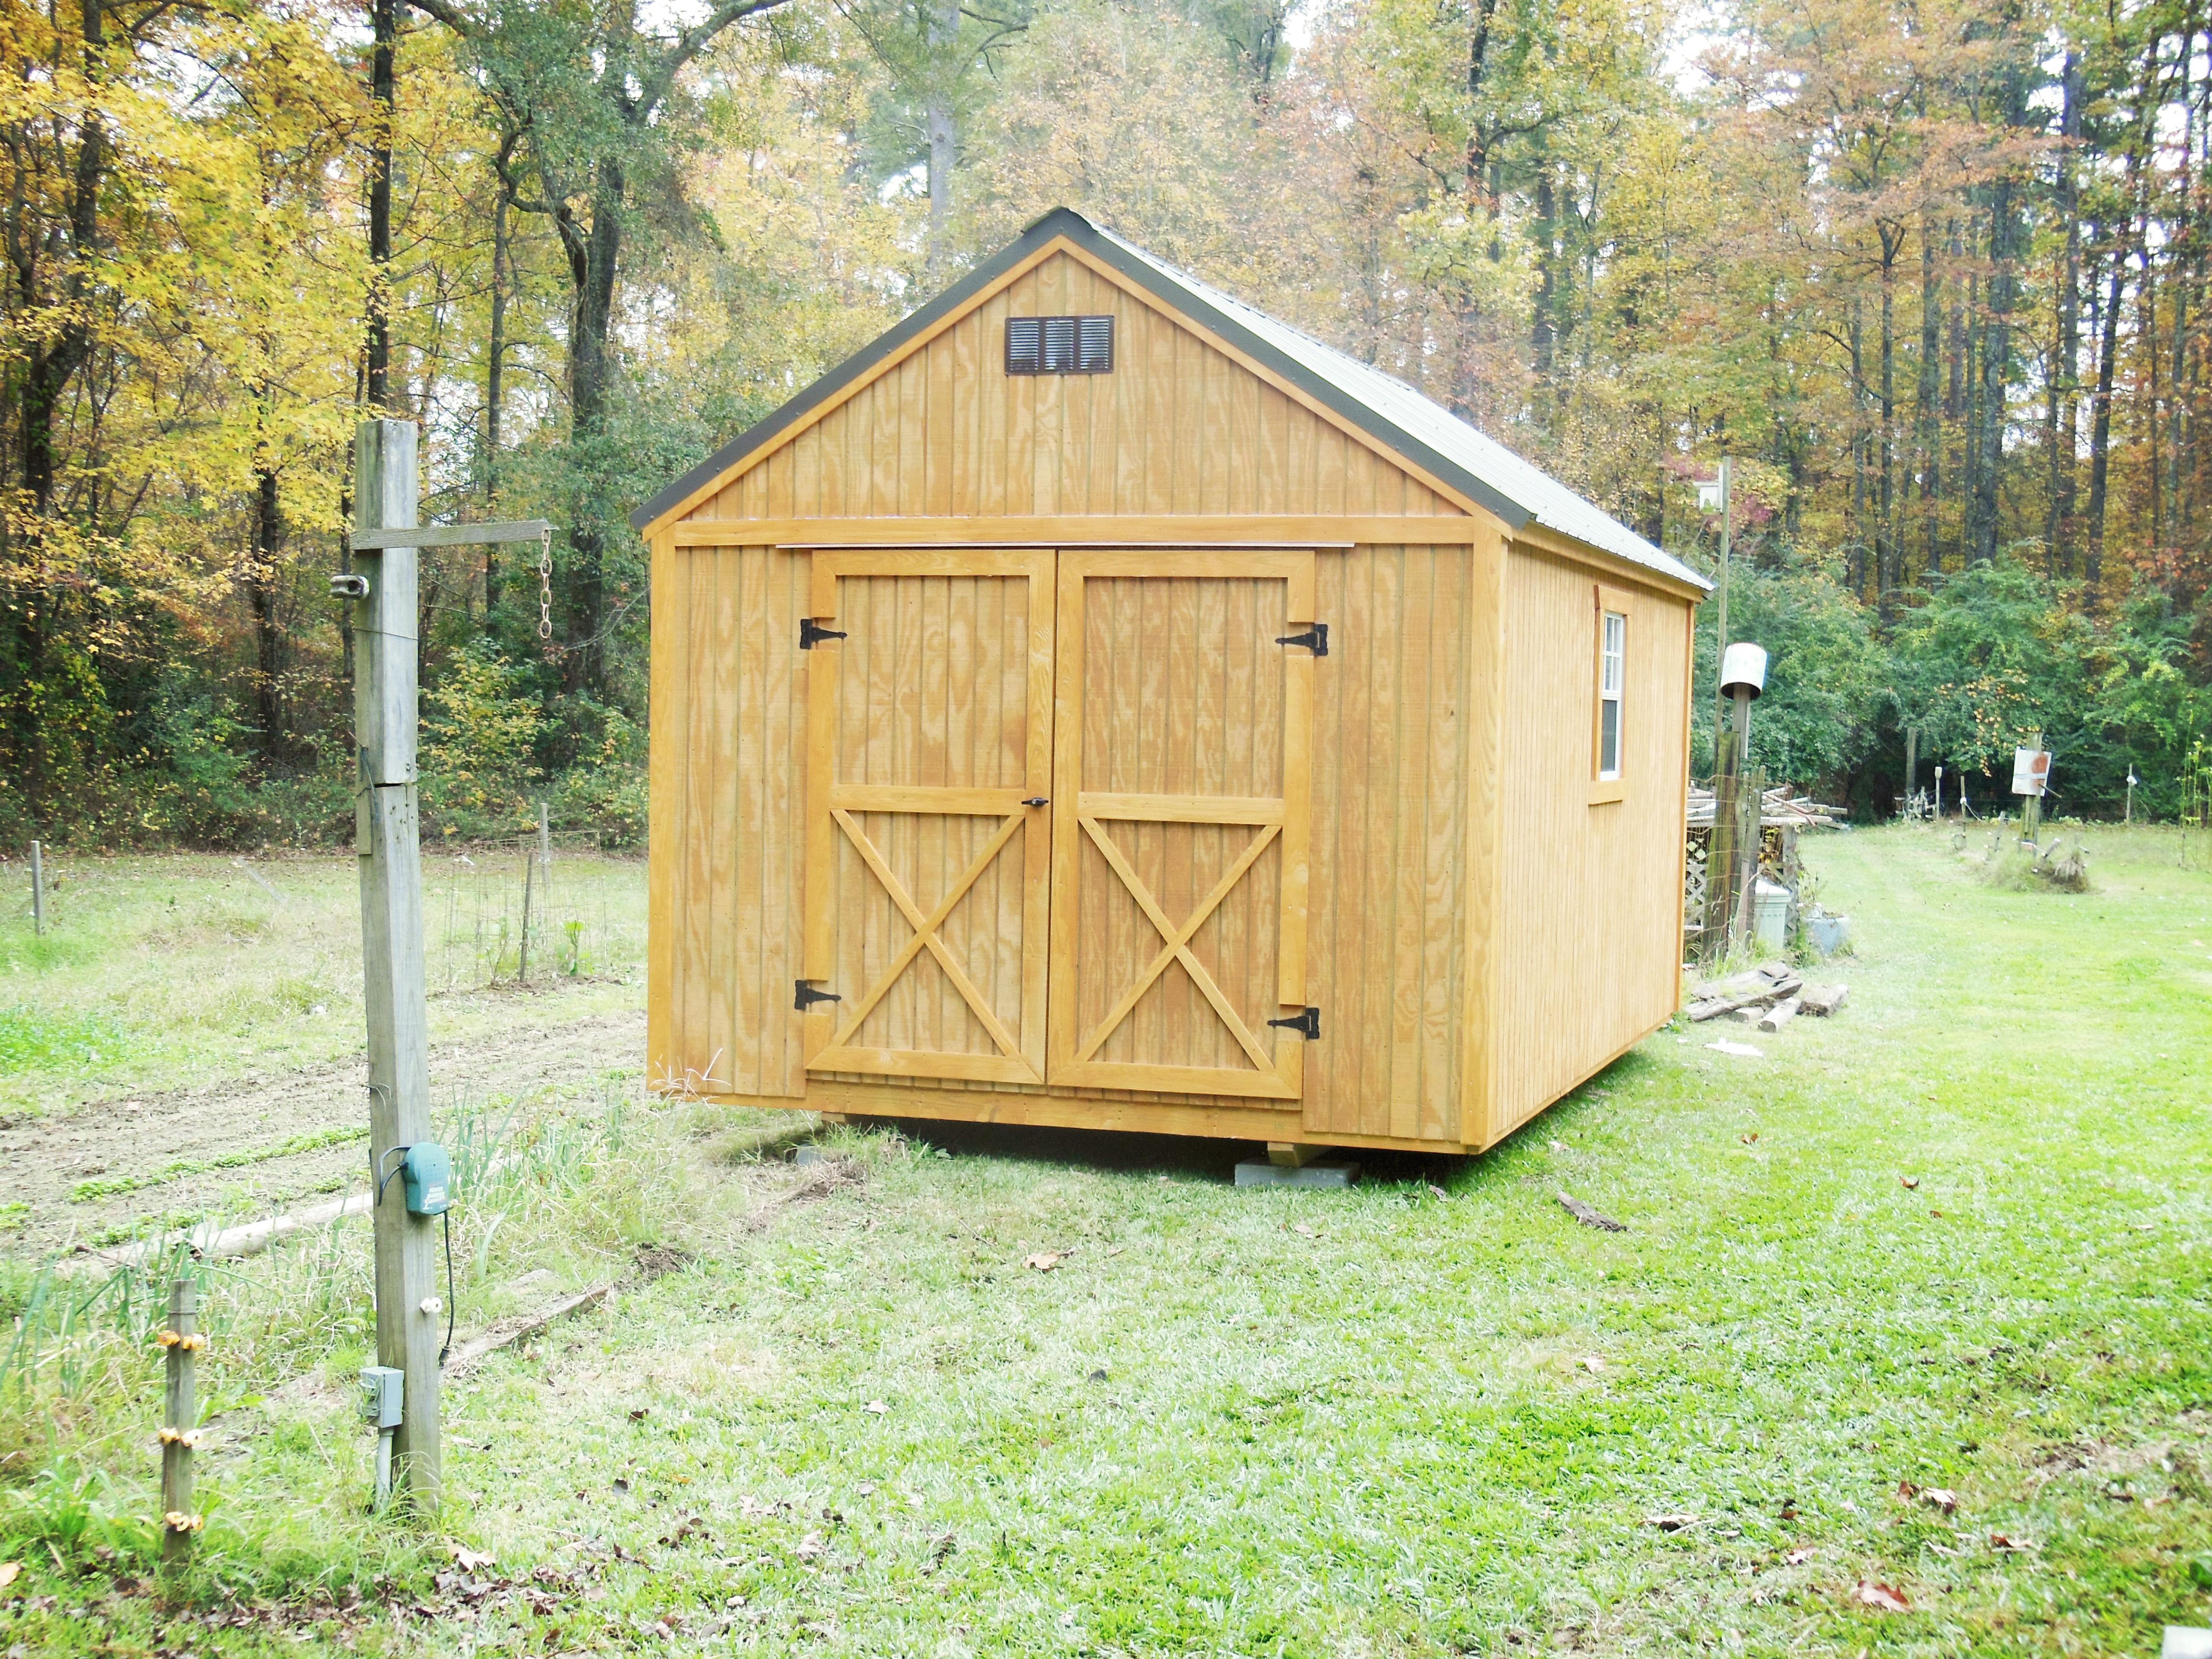 Lofted Utility Portable Storage Building